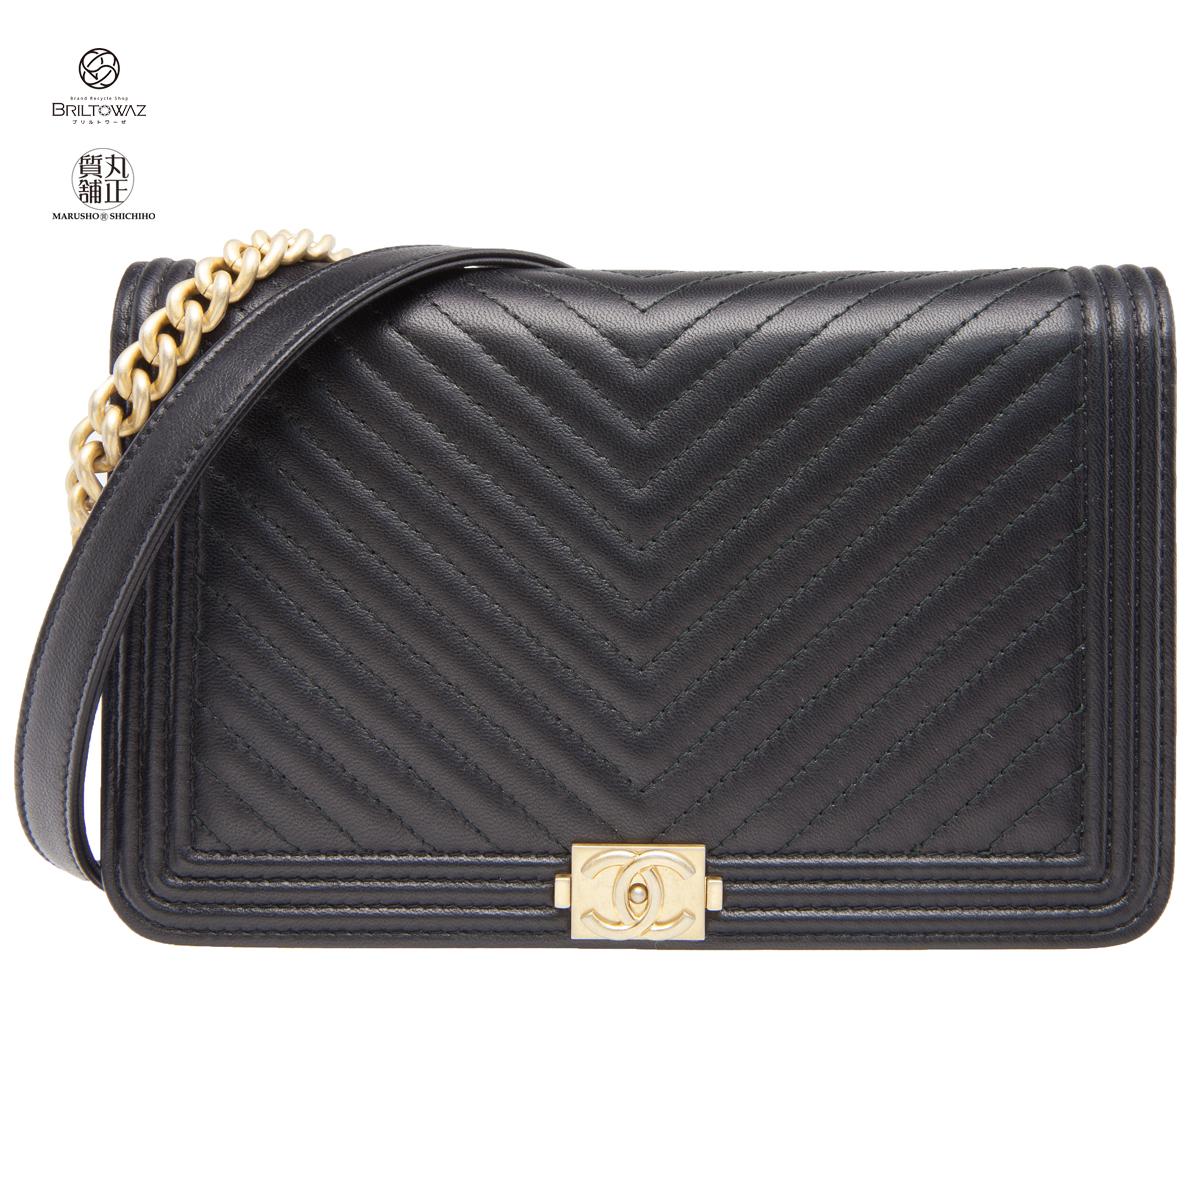 3b3b8d69381a91 Chanel boy Chanel Chevron chain wallet shoulder bag A81969 2019SS Japanese  non-release lambskin black ...